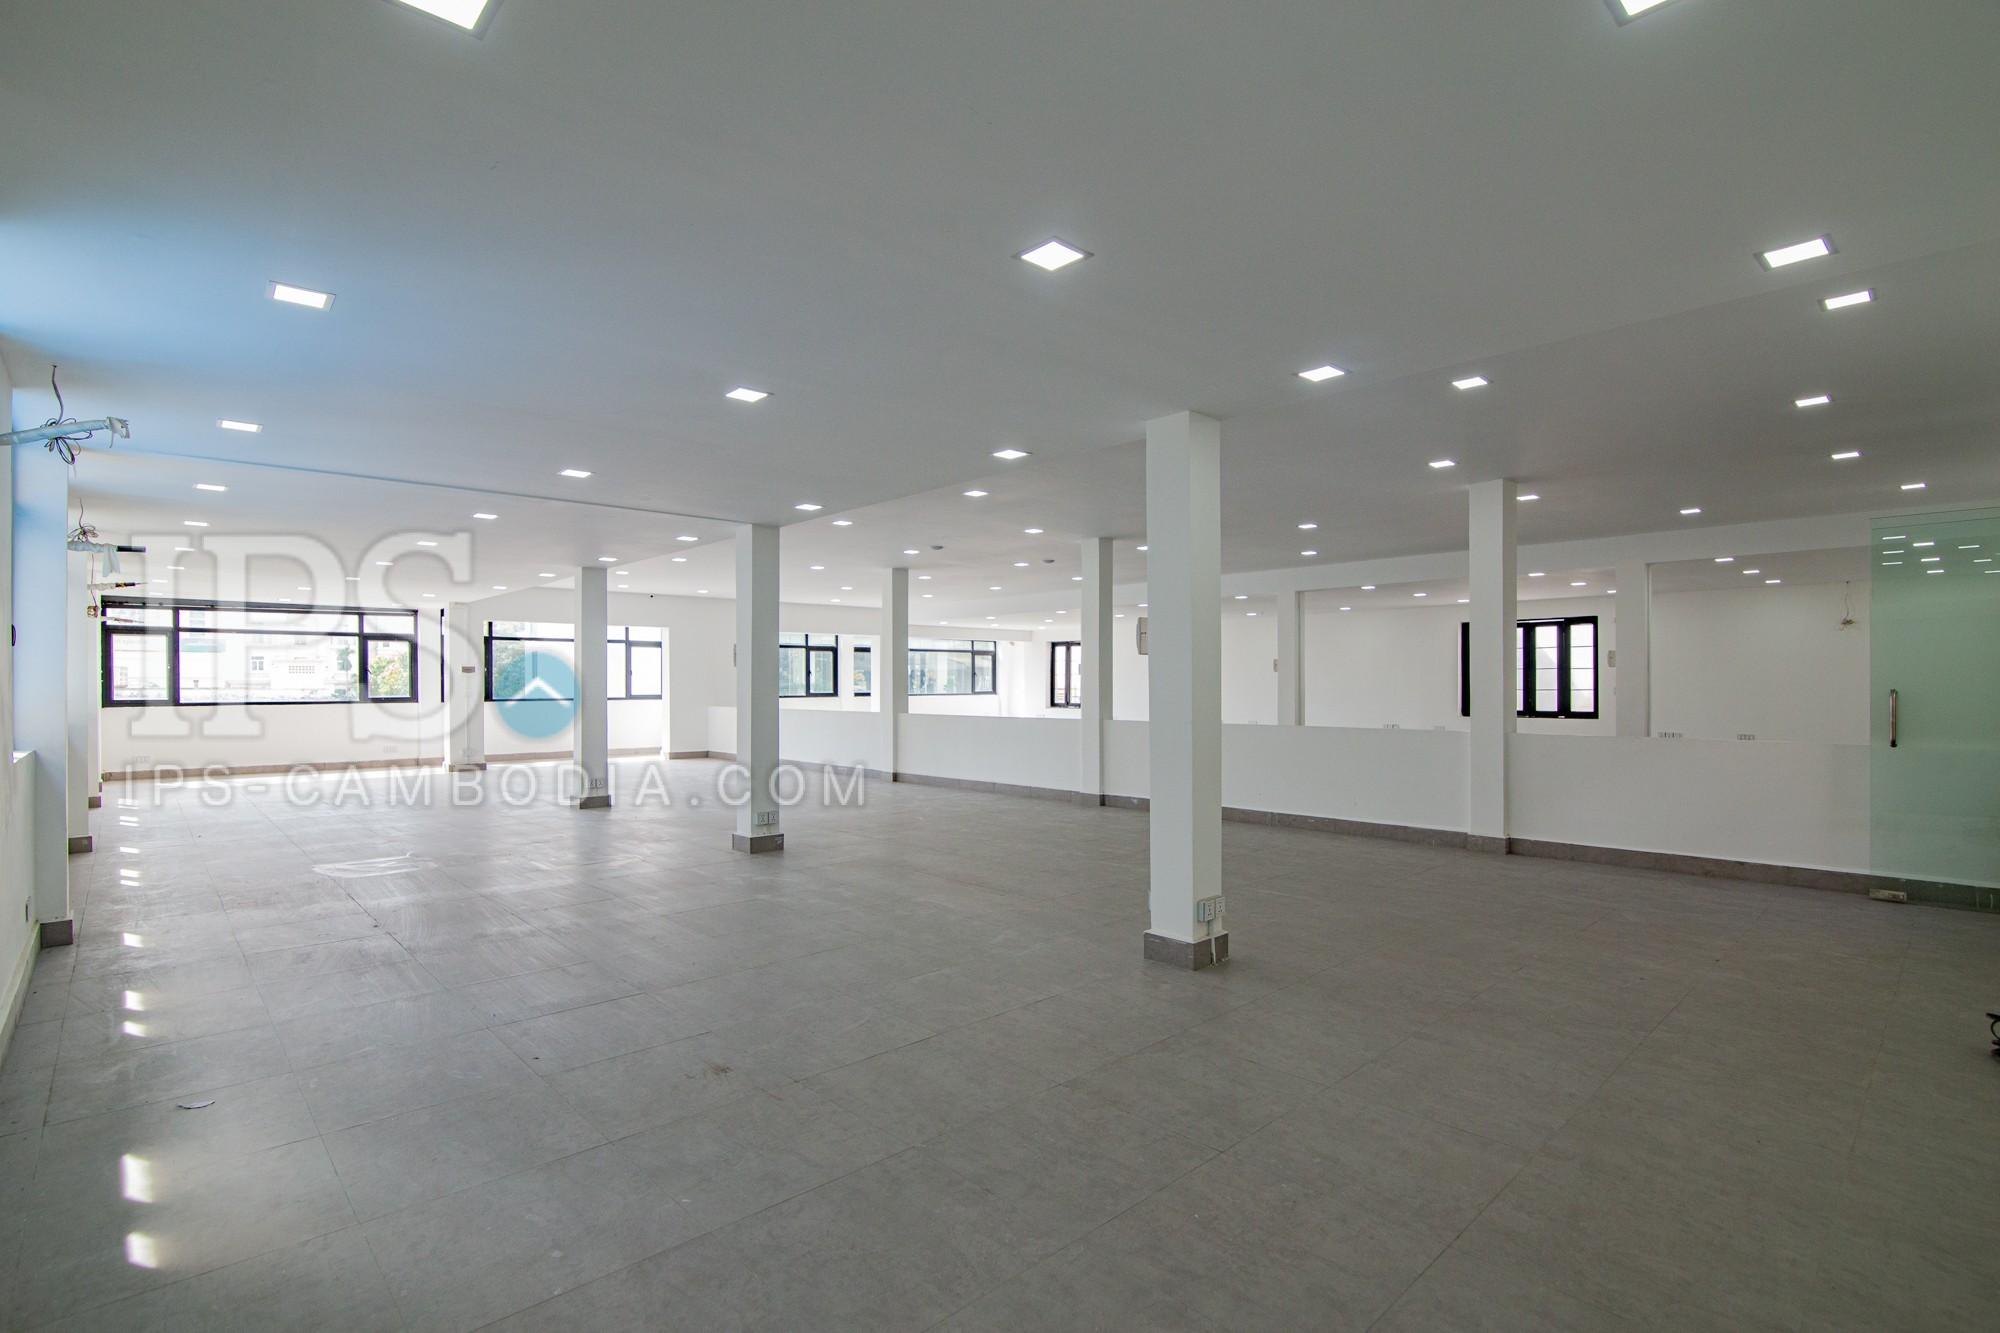 350 Sqm Office Space For Rent - Daun Penh, Phnom penh